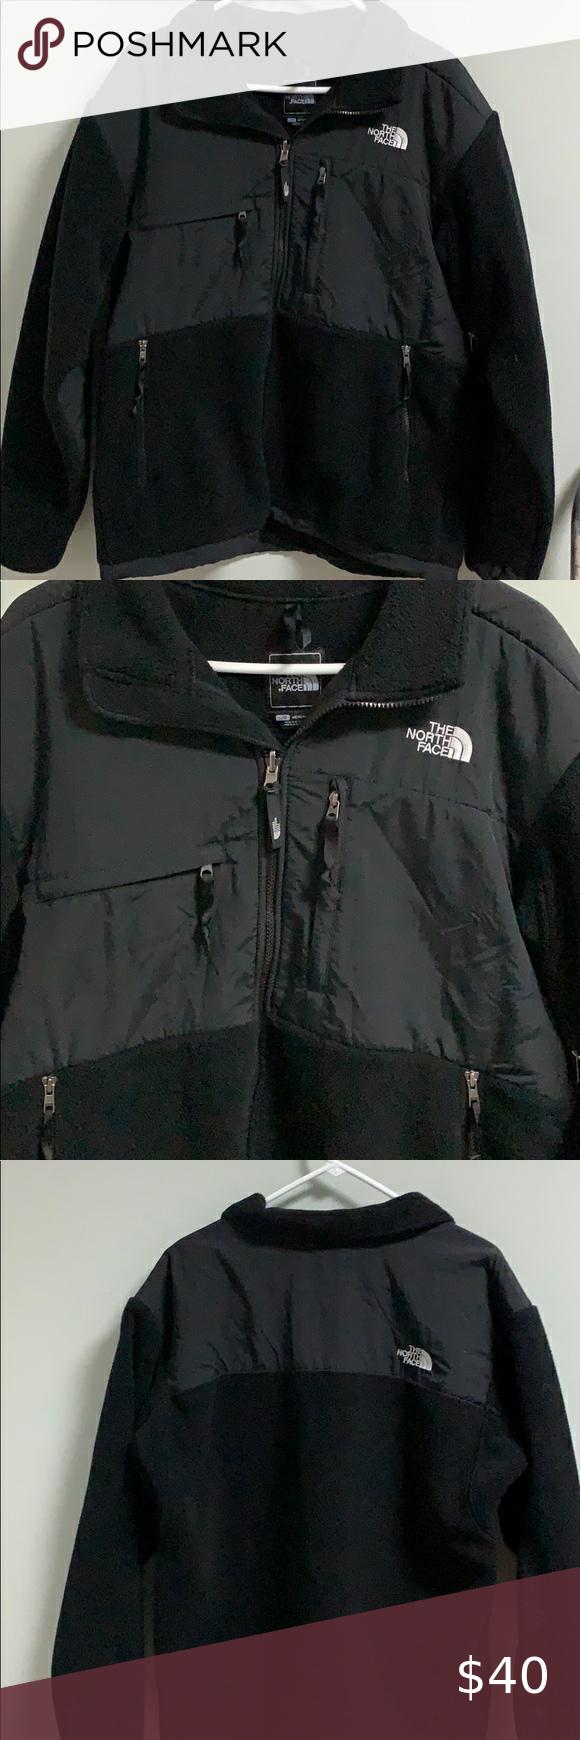 Men S North Face Jacket North Face Jacket Black North Face Jacket North Face Jacket Mens [ 1740 x 580 Pixel ]